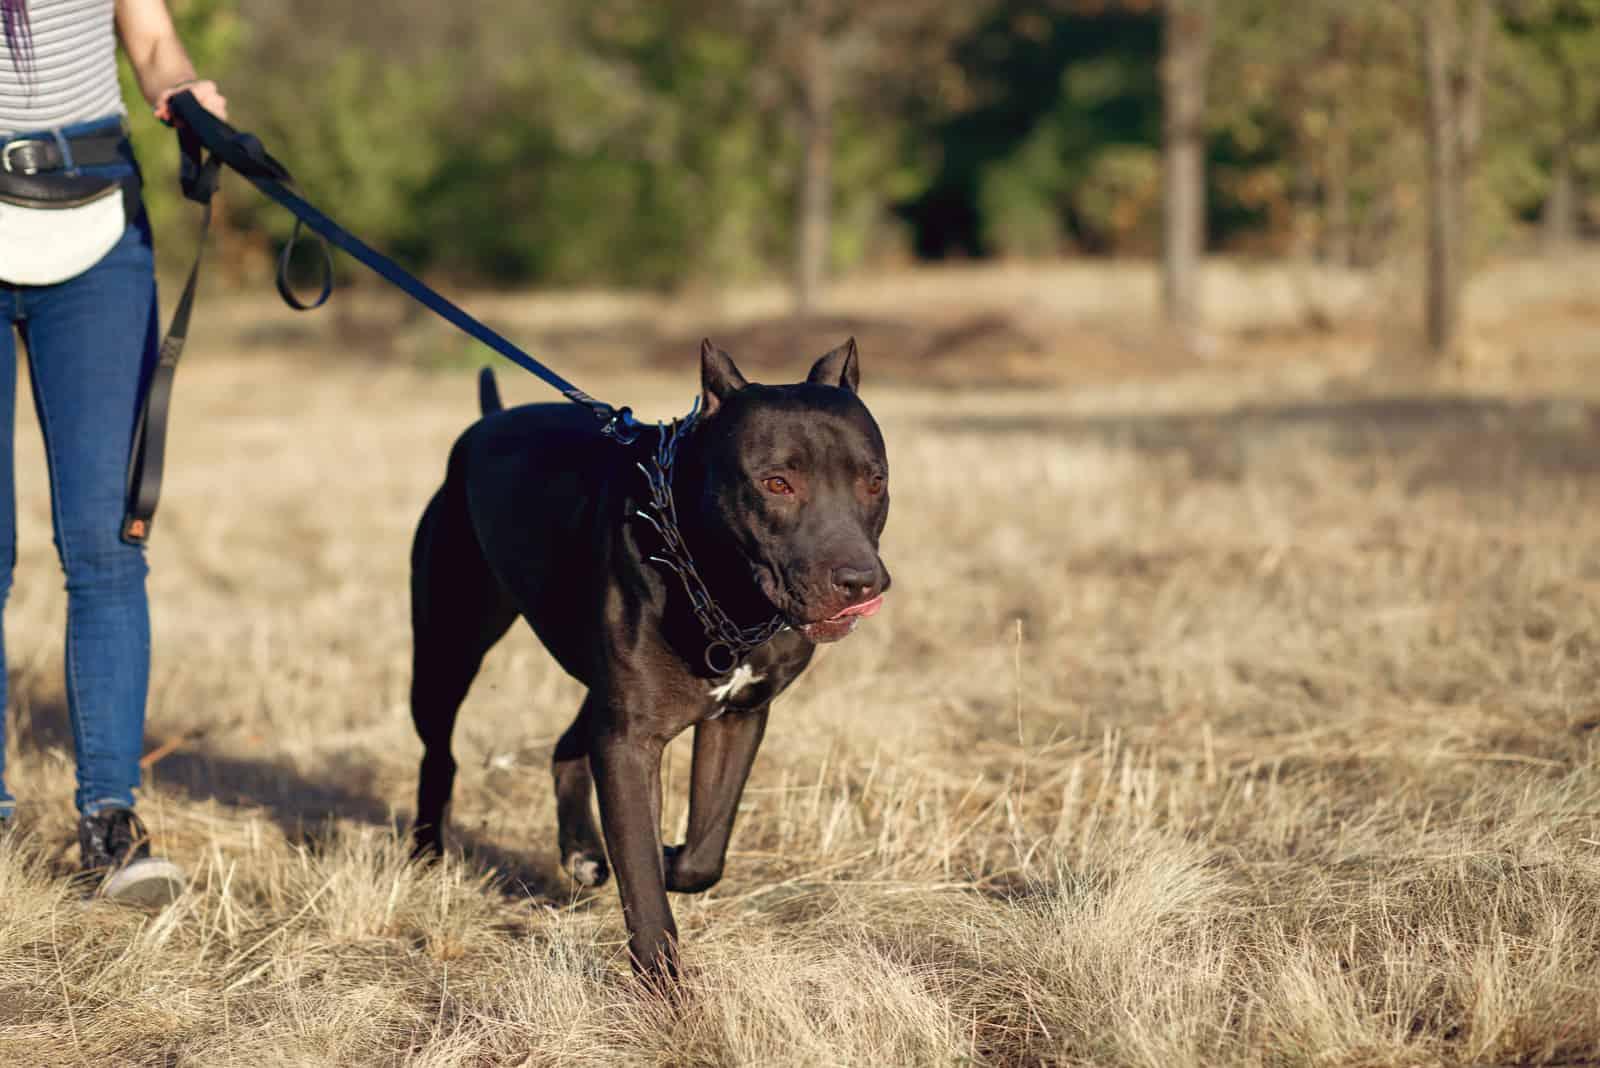 woman walks a big black pitbull on a leash in the park